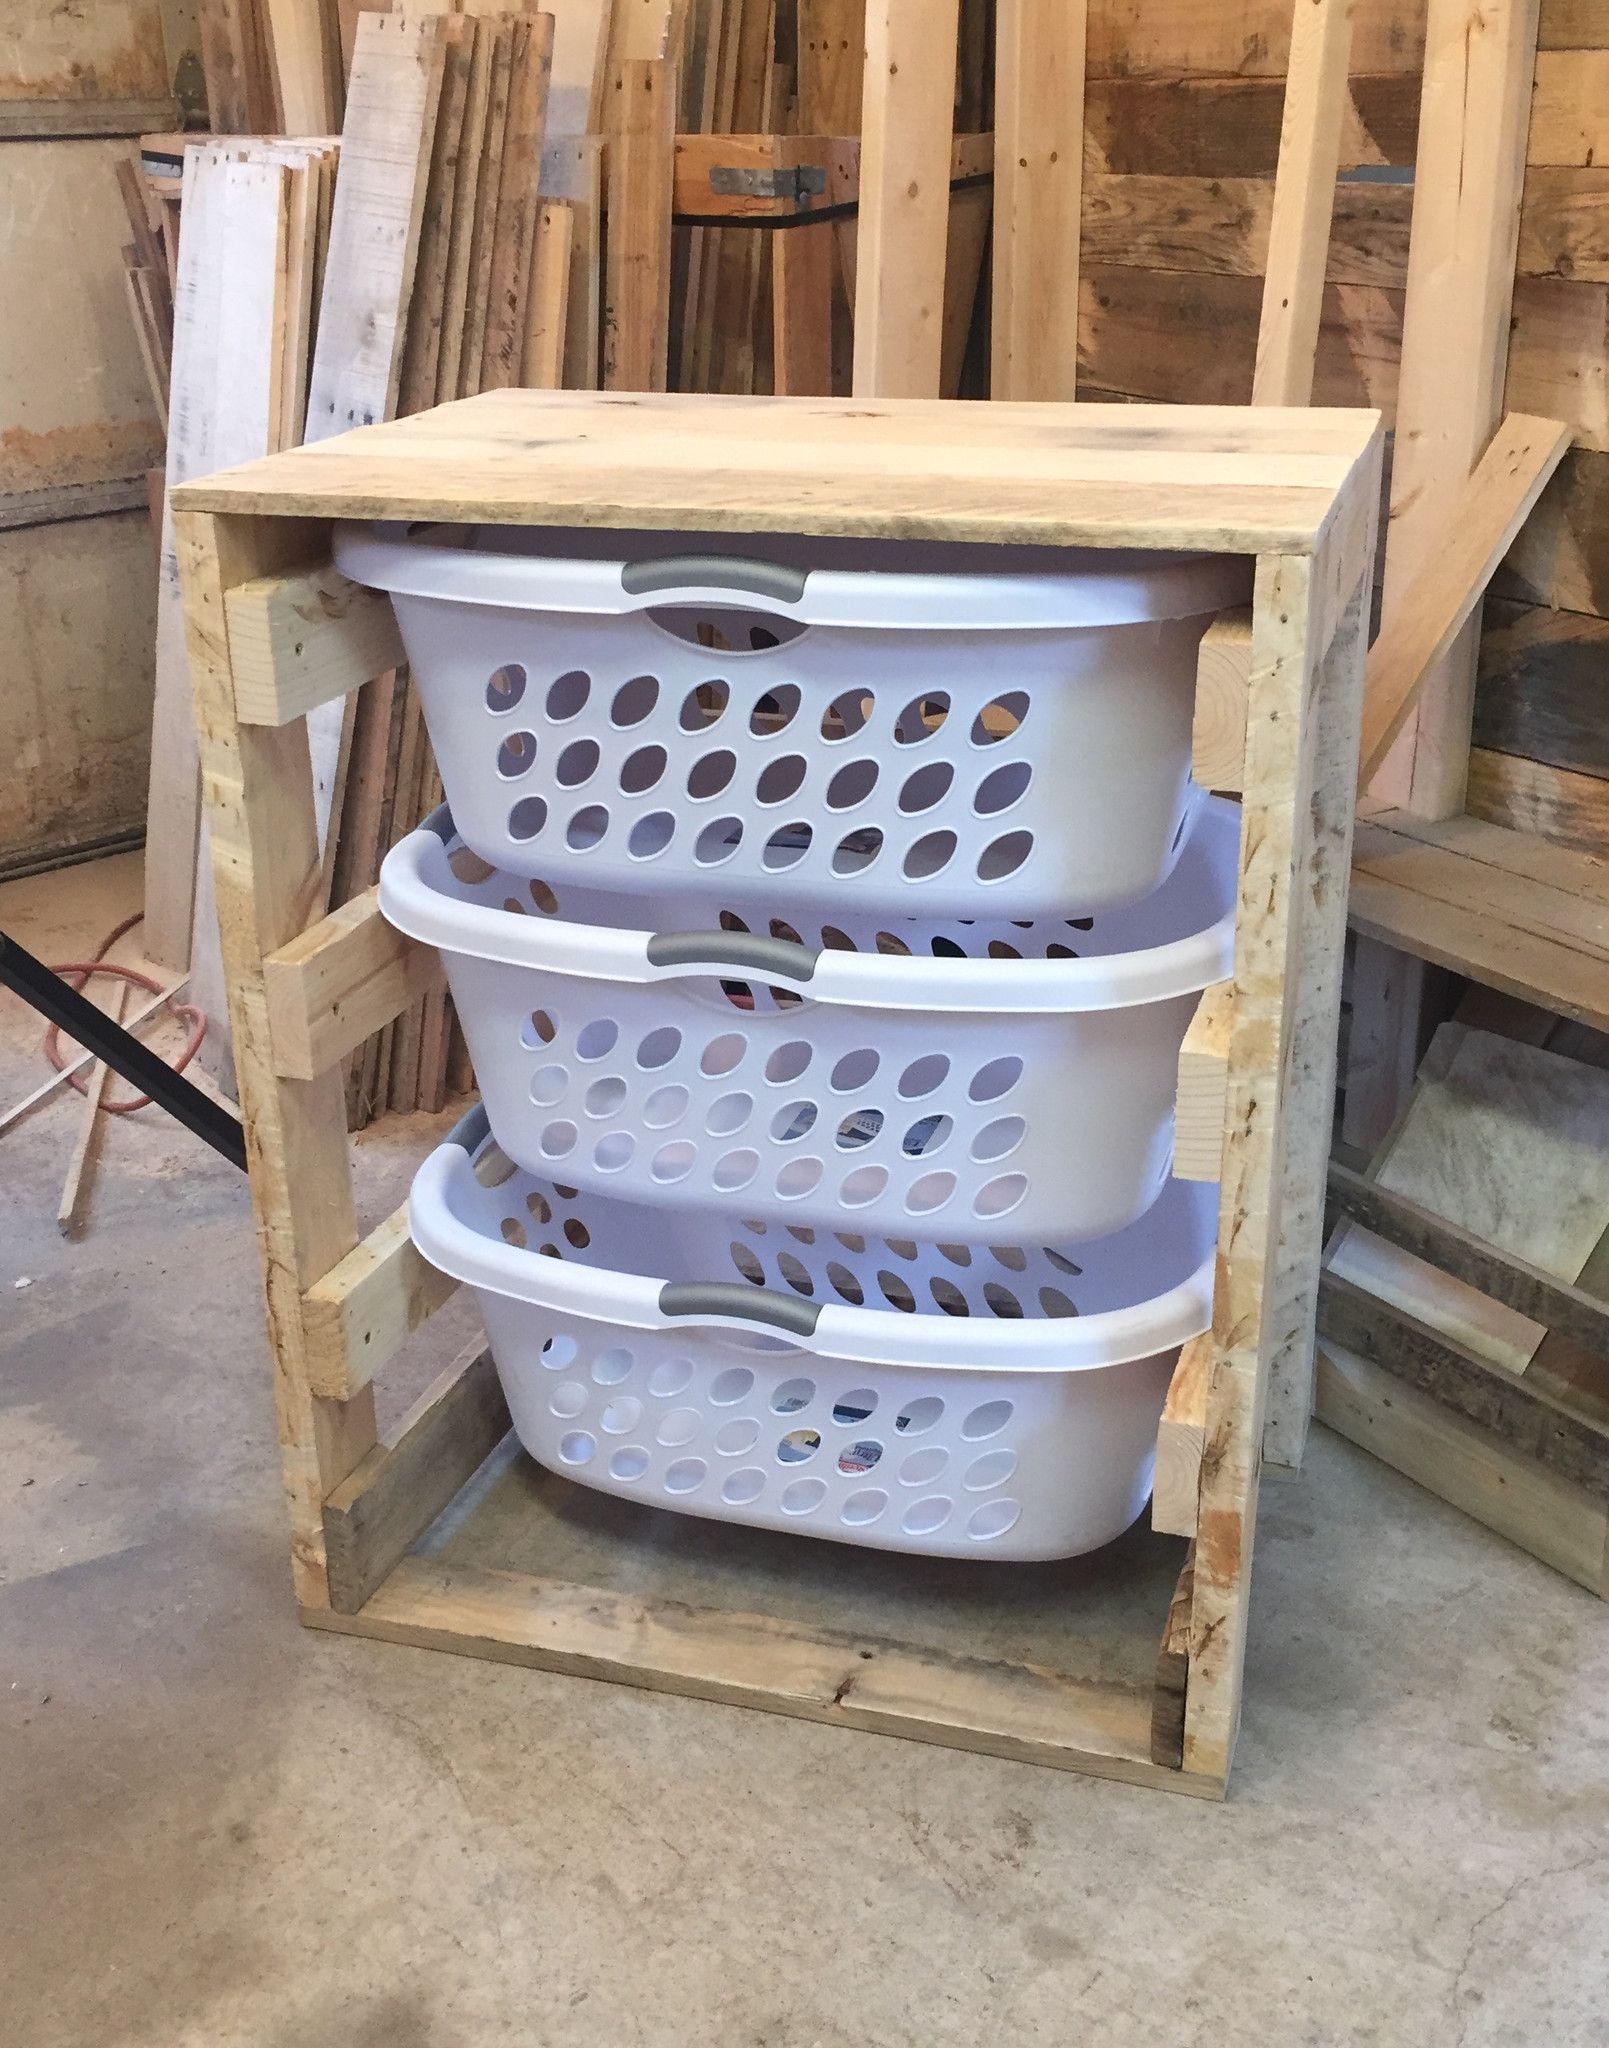 Laundry Chest Laundry Basket Dresser Laundry Room Organization